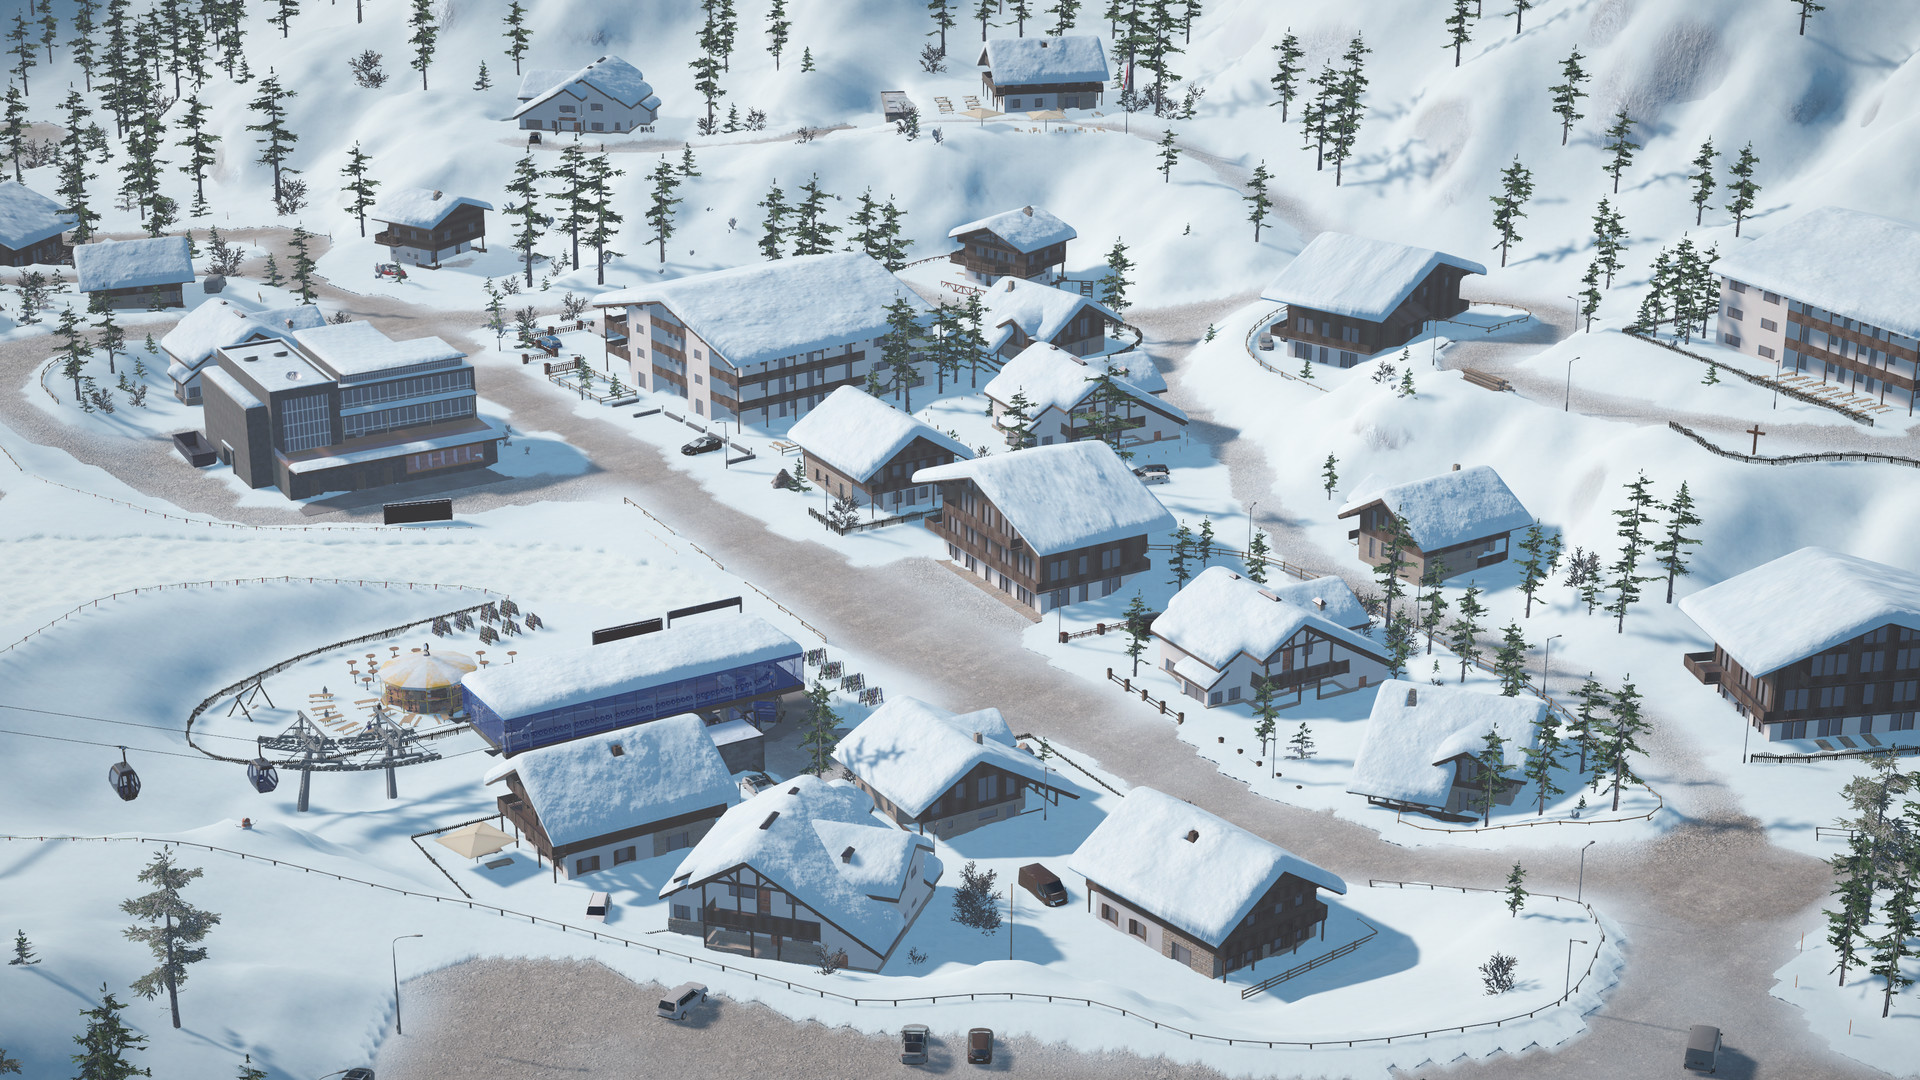 winter-resort-simulator-s2-pc-screenshot-01